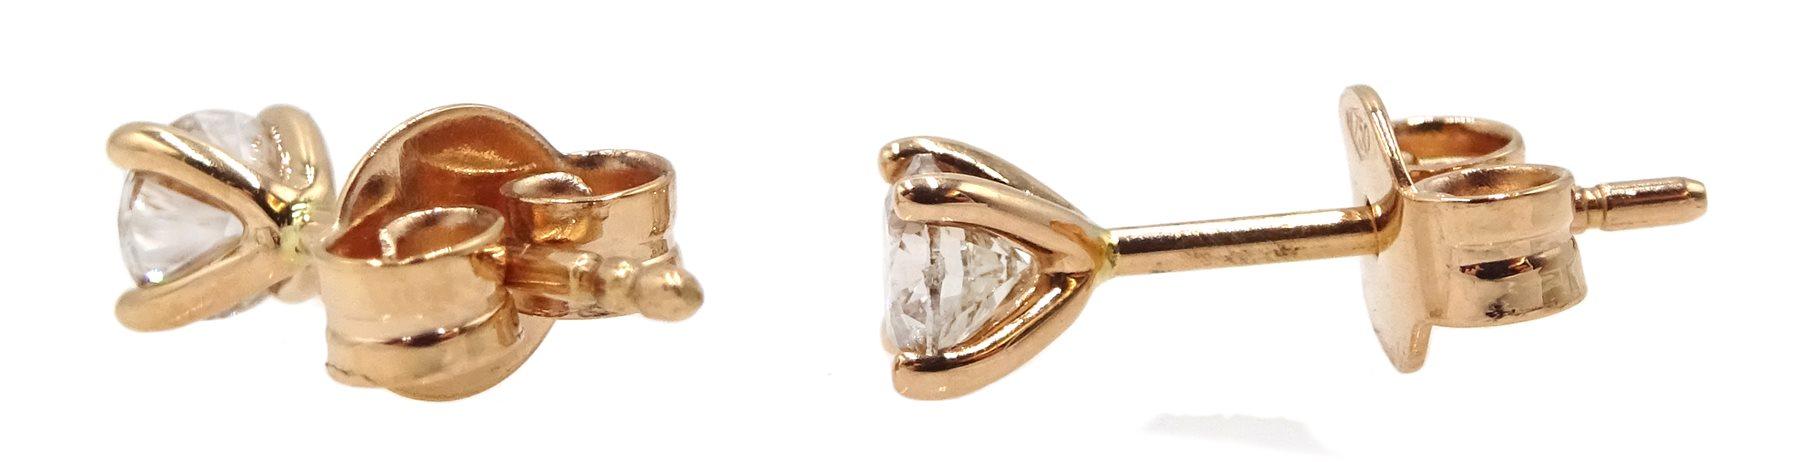 Pair of 18ct rose gold brilliant cut diamond stud earrings - Image 2 of 2